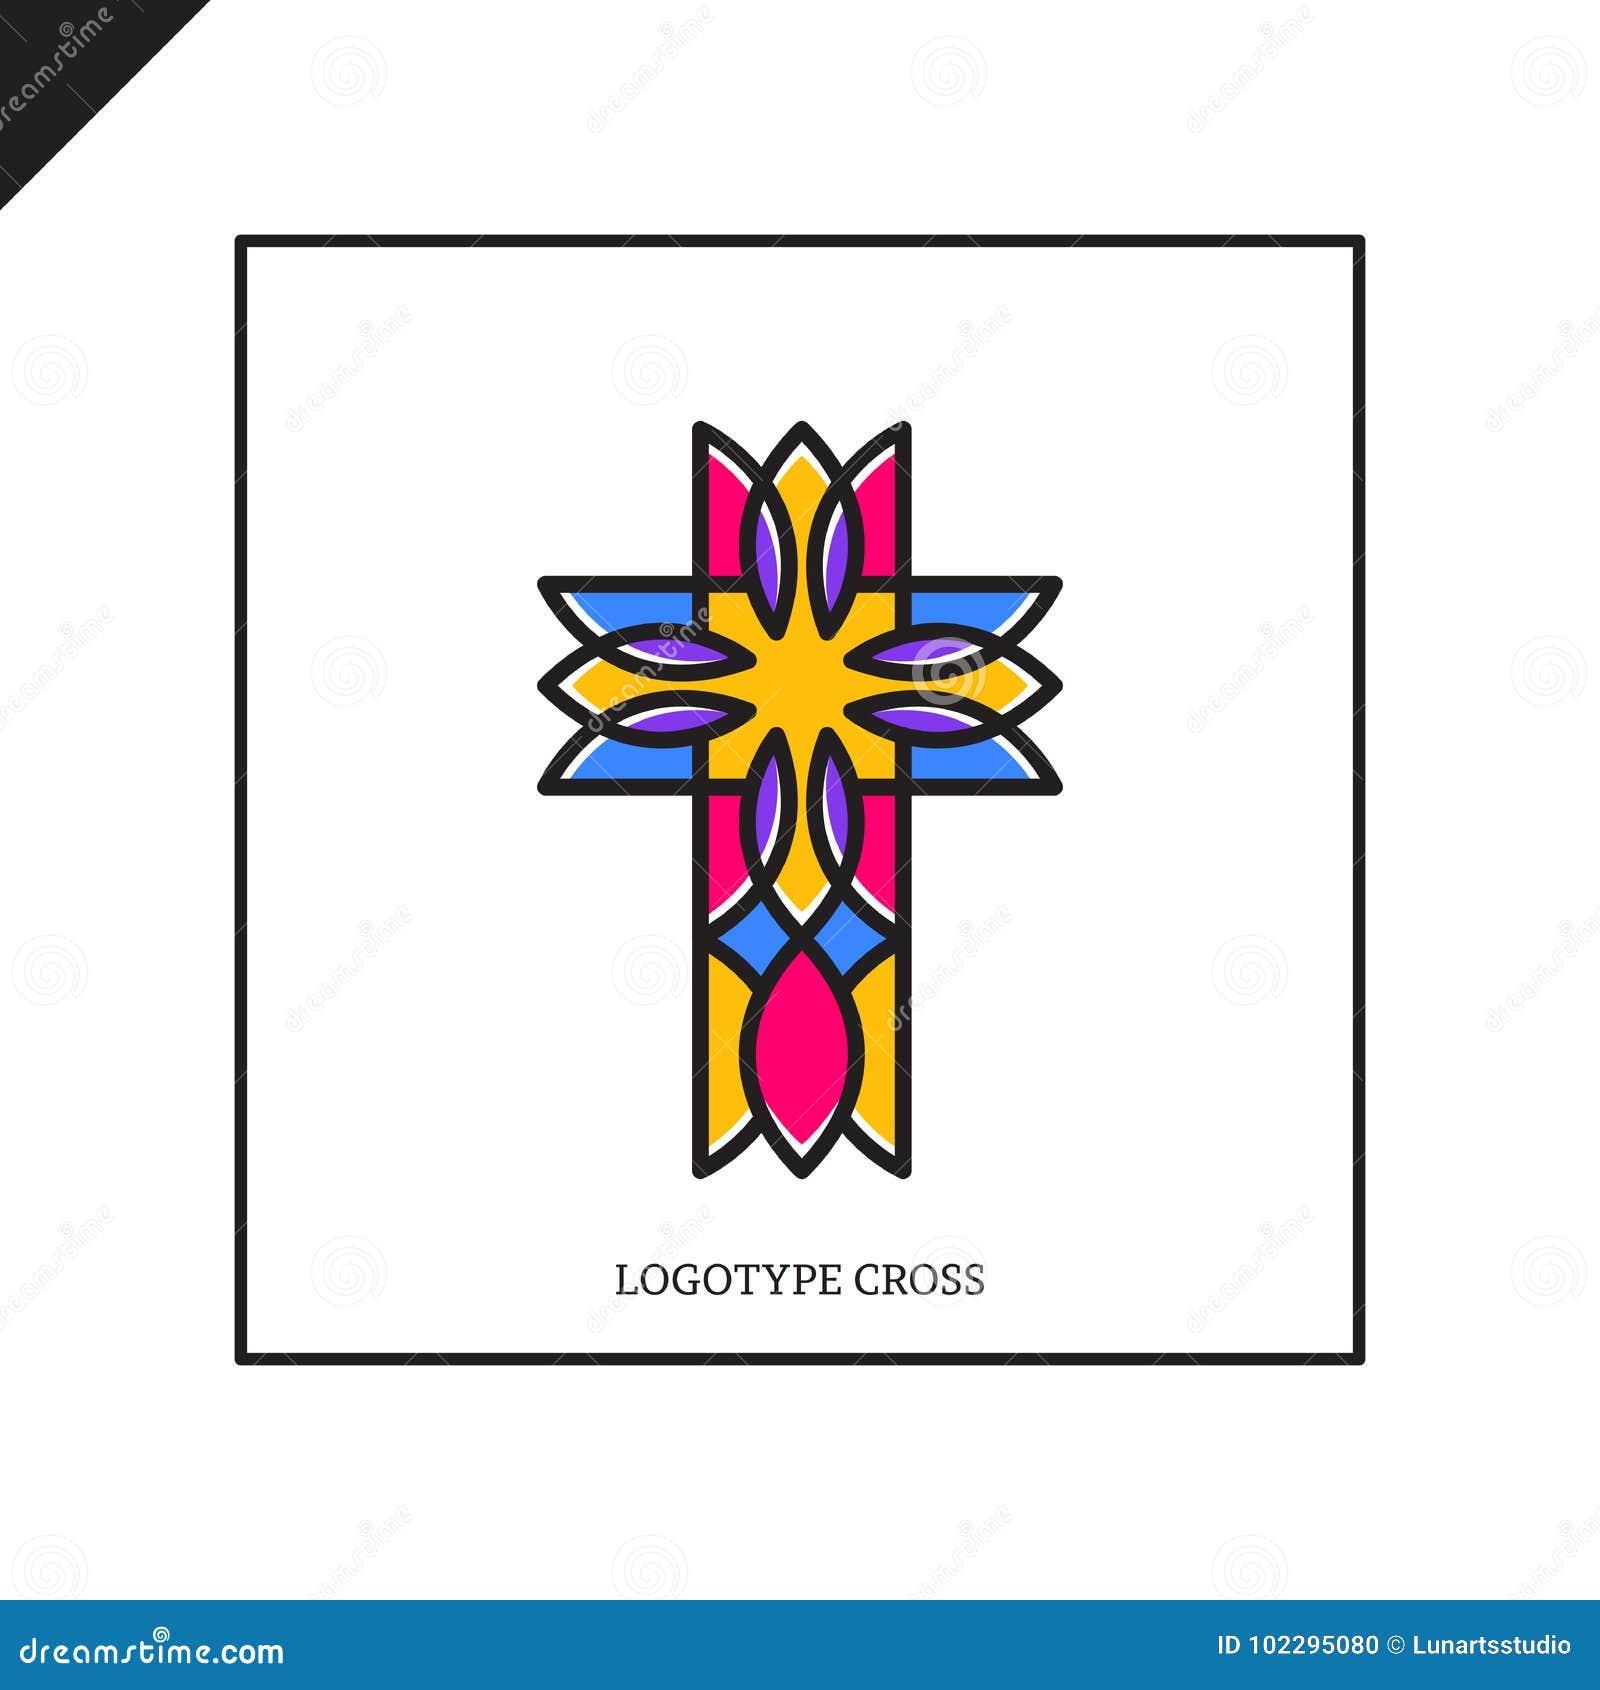 Church logo christian symbols jesus cross stock illustration church logo christian symbols jesus cross advocate faith biocorpaavc Gallery